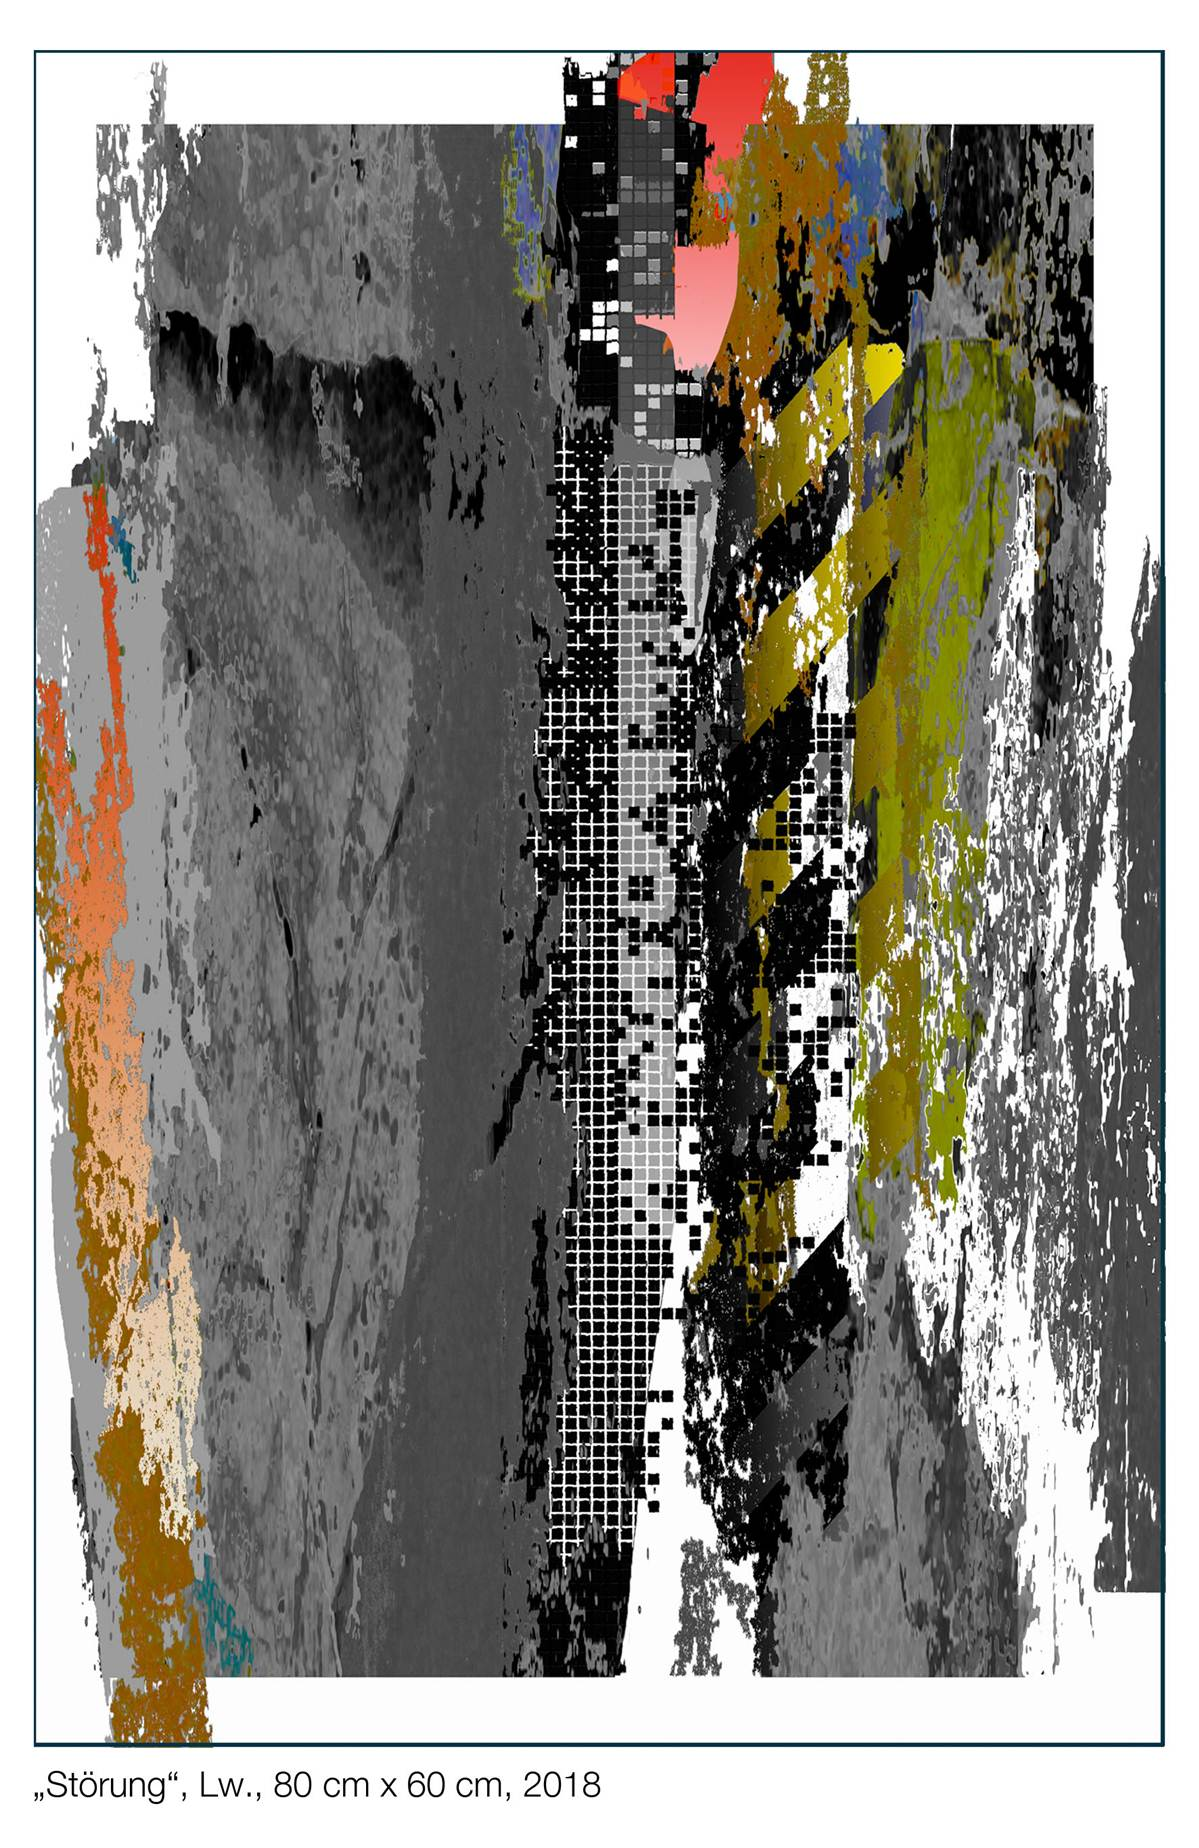 280674 gerhard%20losemann%2c%20st%c3%b6rung%2c%20c print%20auf%20leinwand%2c%202018%2c%20%28c%29%20k%c3%bcnstler da82f1 original 1527062132